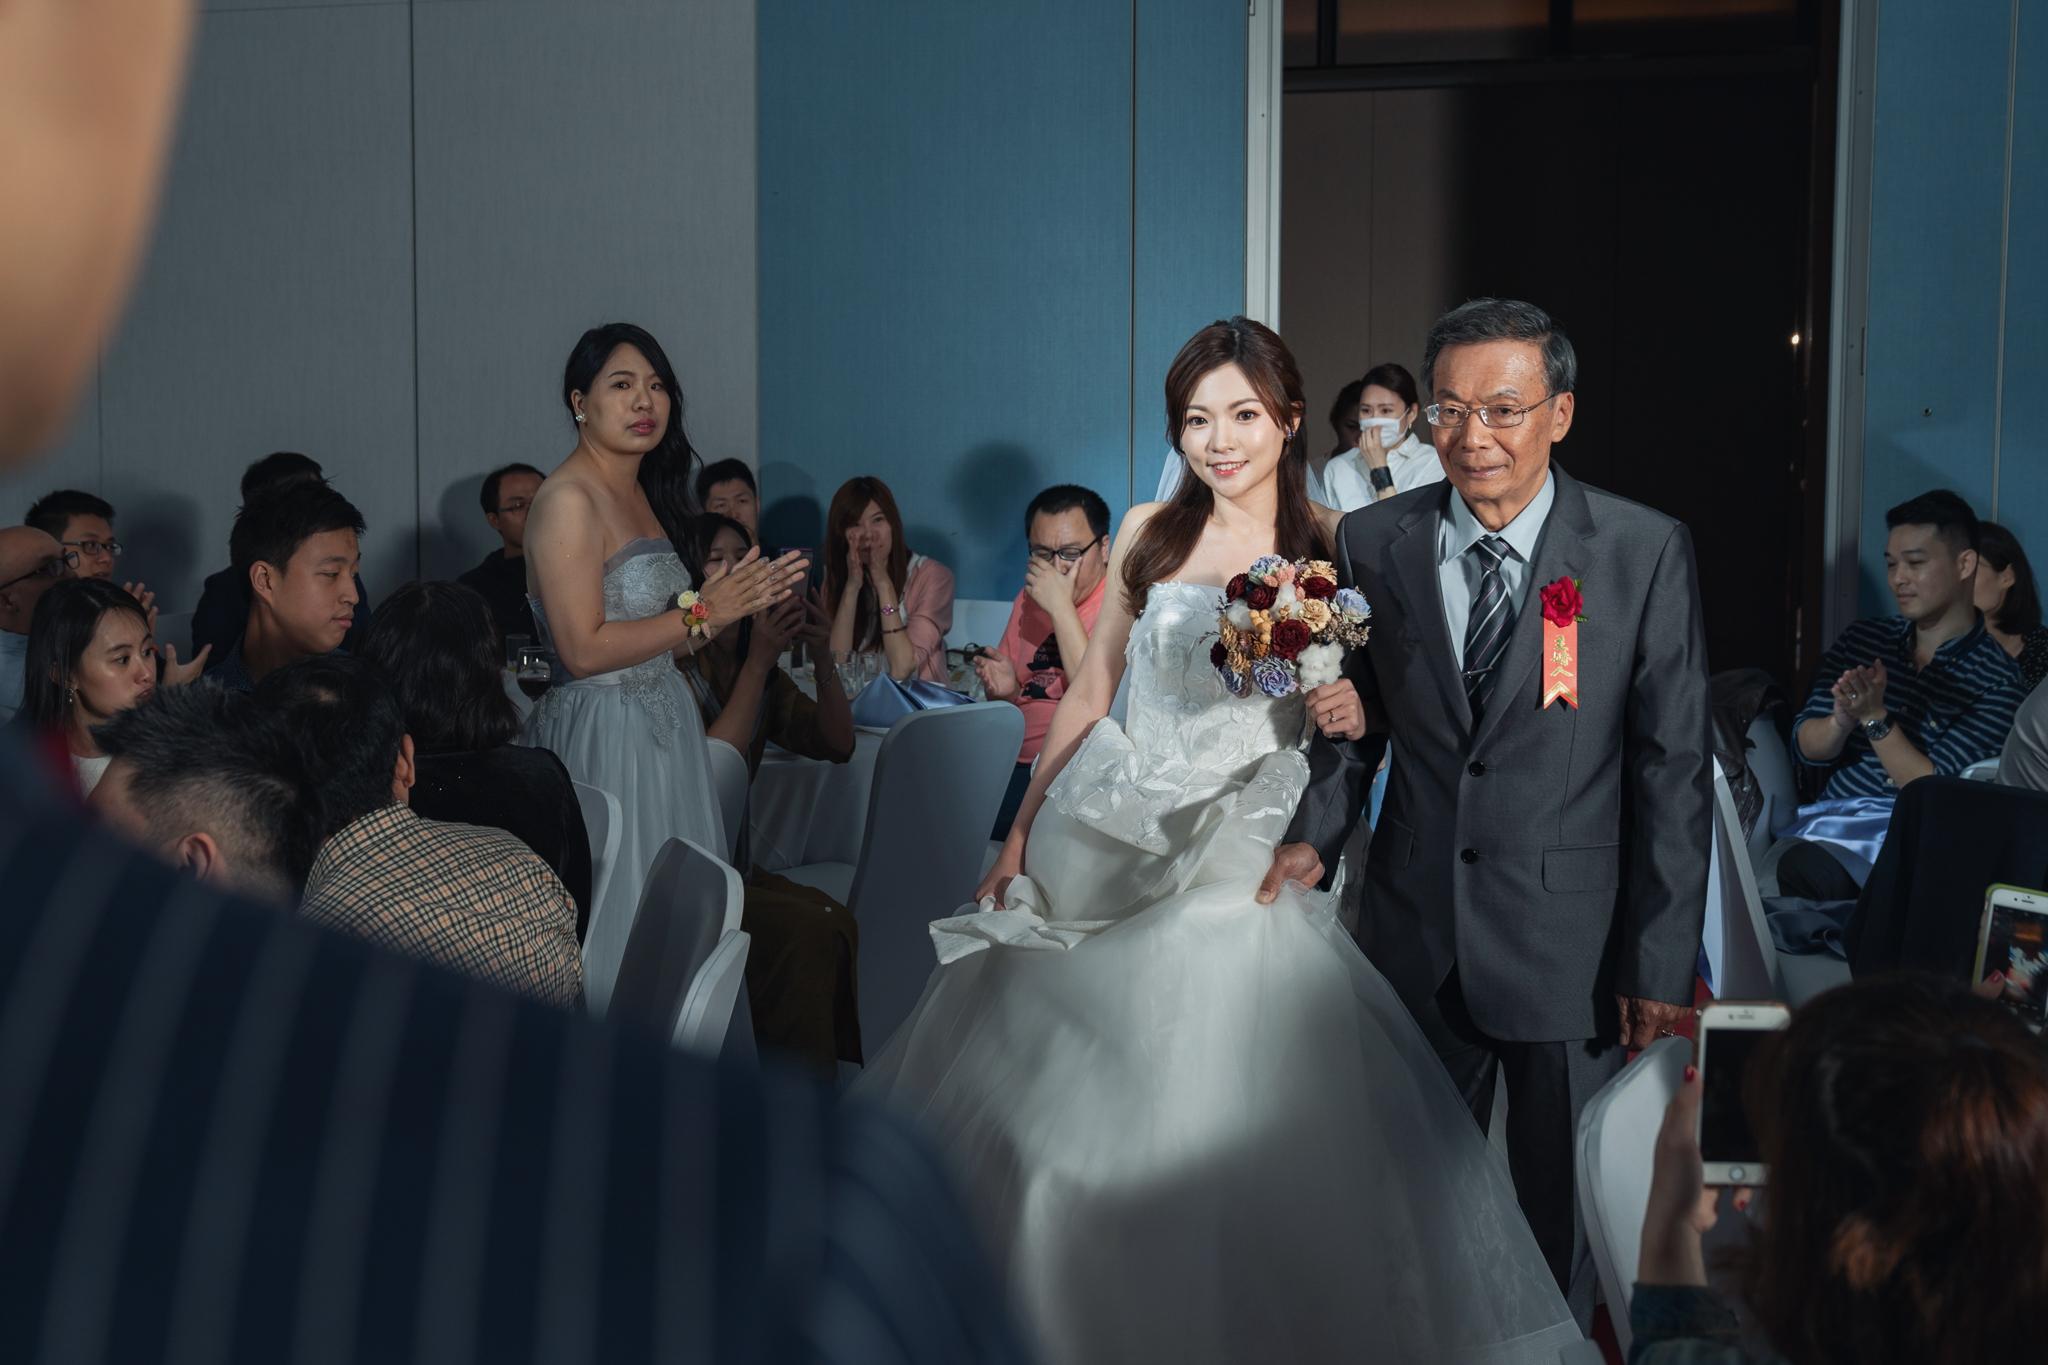 EASTERN WEDDING, 東法, Donfer, 板橋凱薩飯店, 婚禮紀錄, EW, 藝術婚禮, 台北婚攝